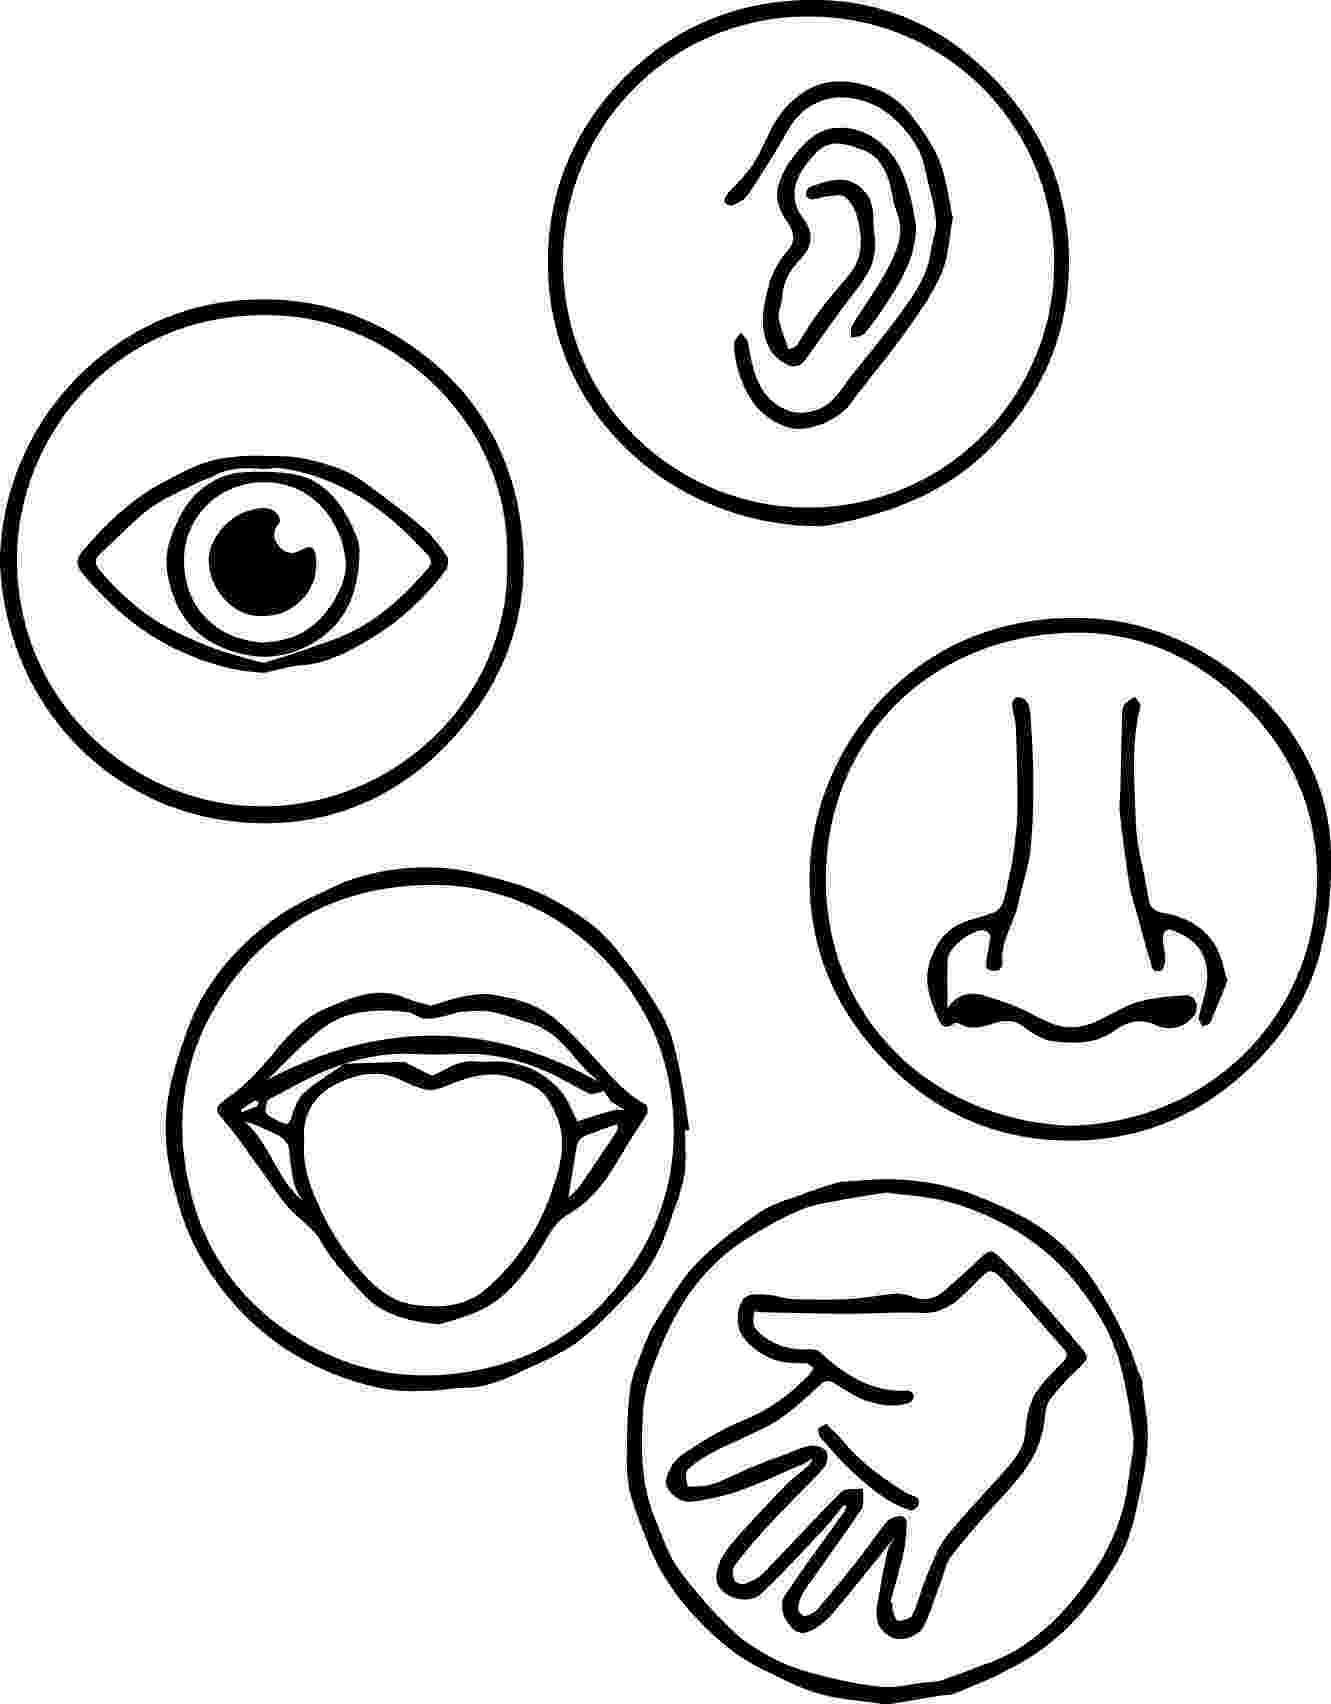 five senses coloring pages five senses coloring page wecoloring five coloring pages senses